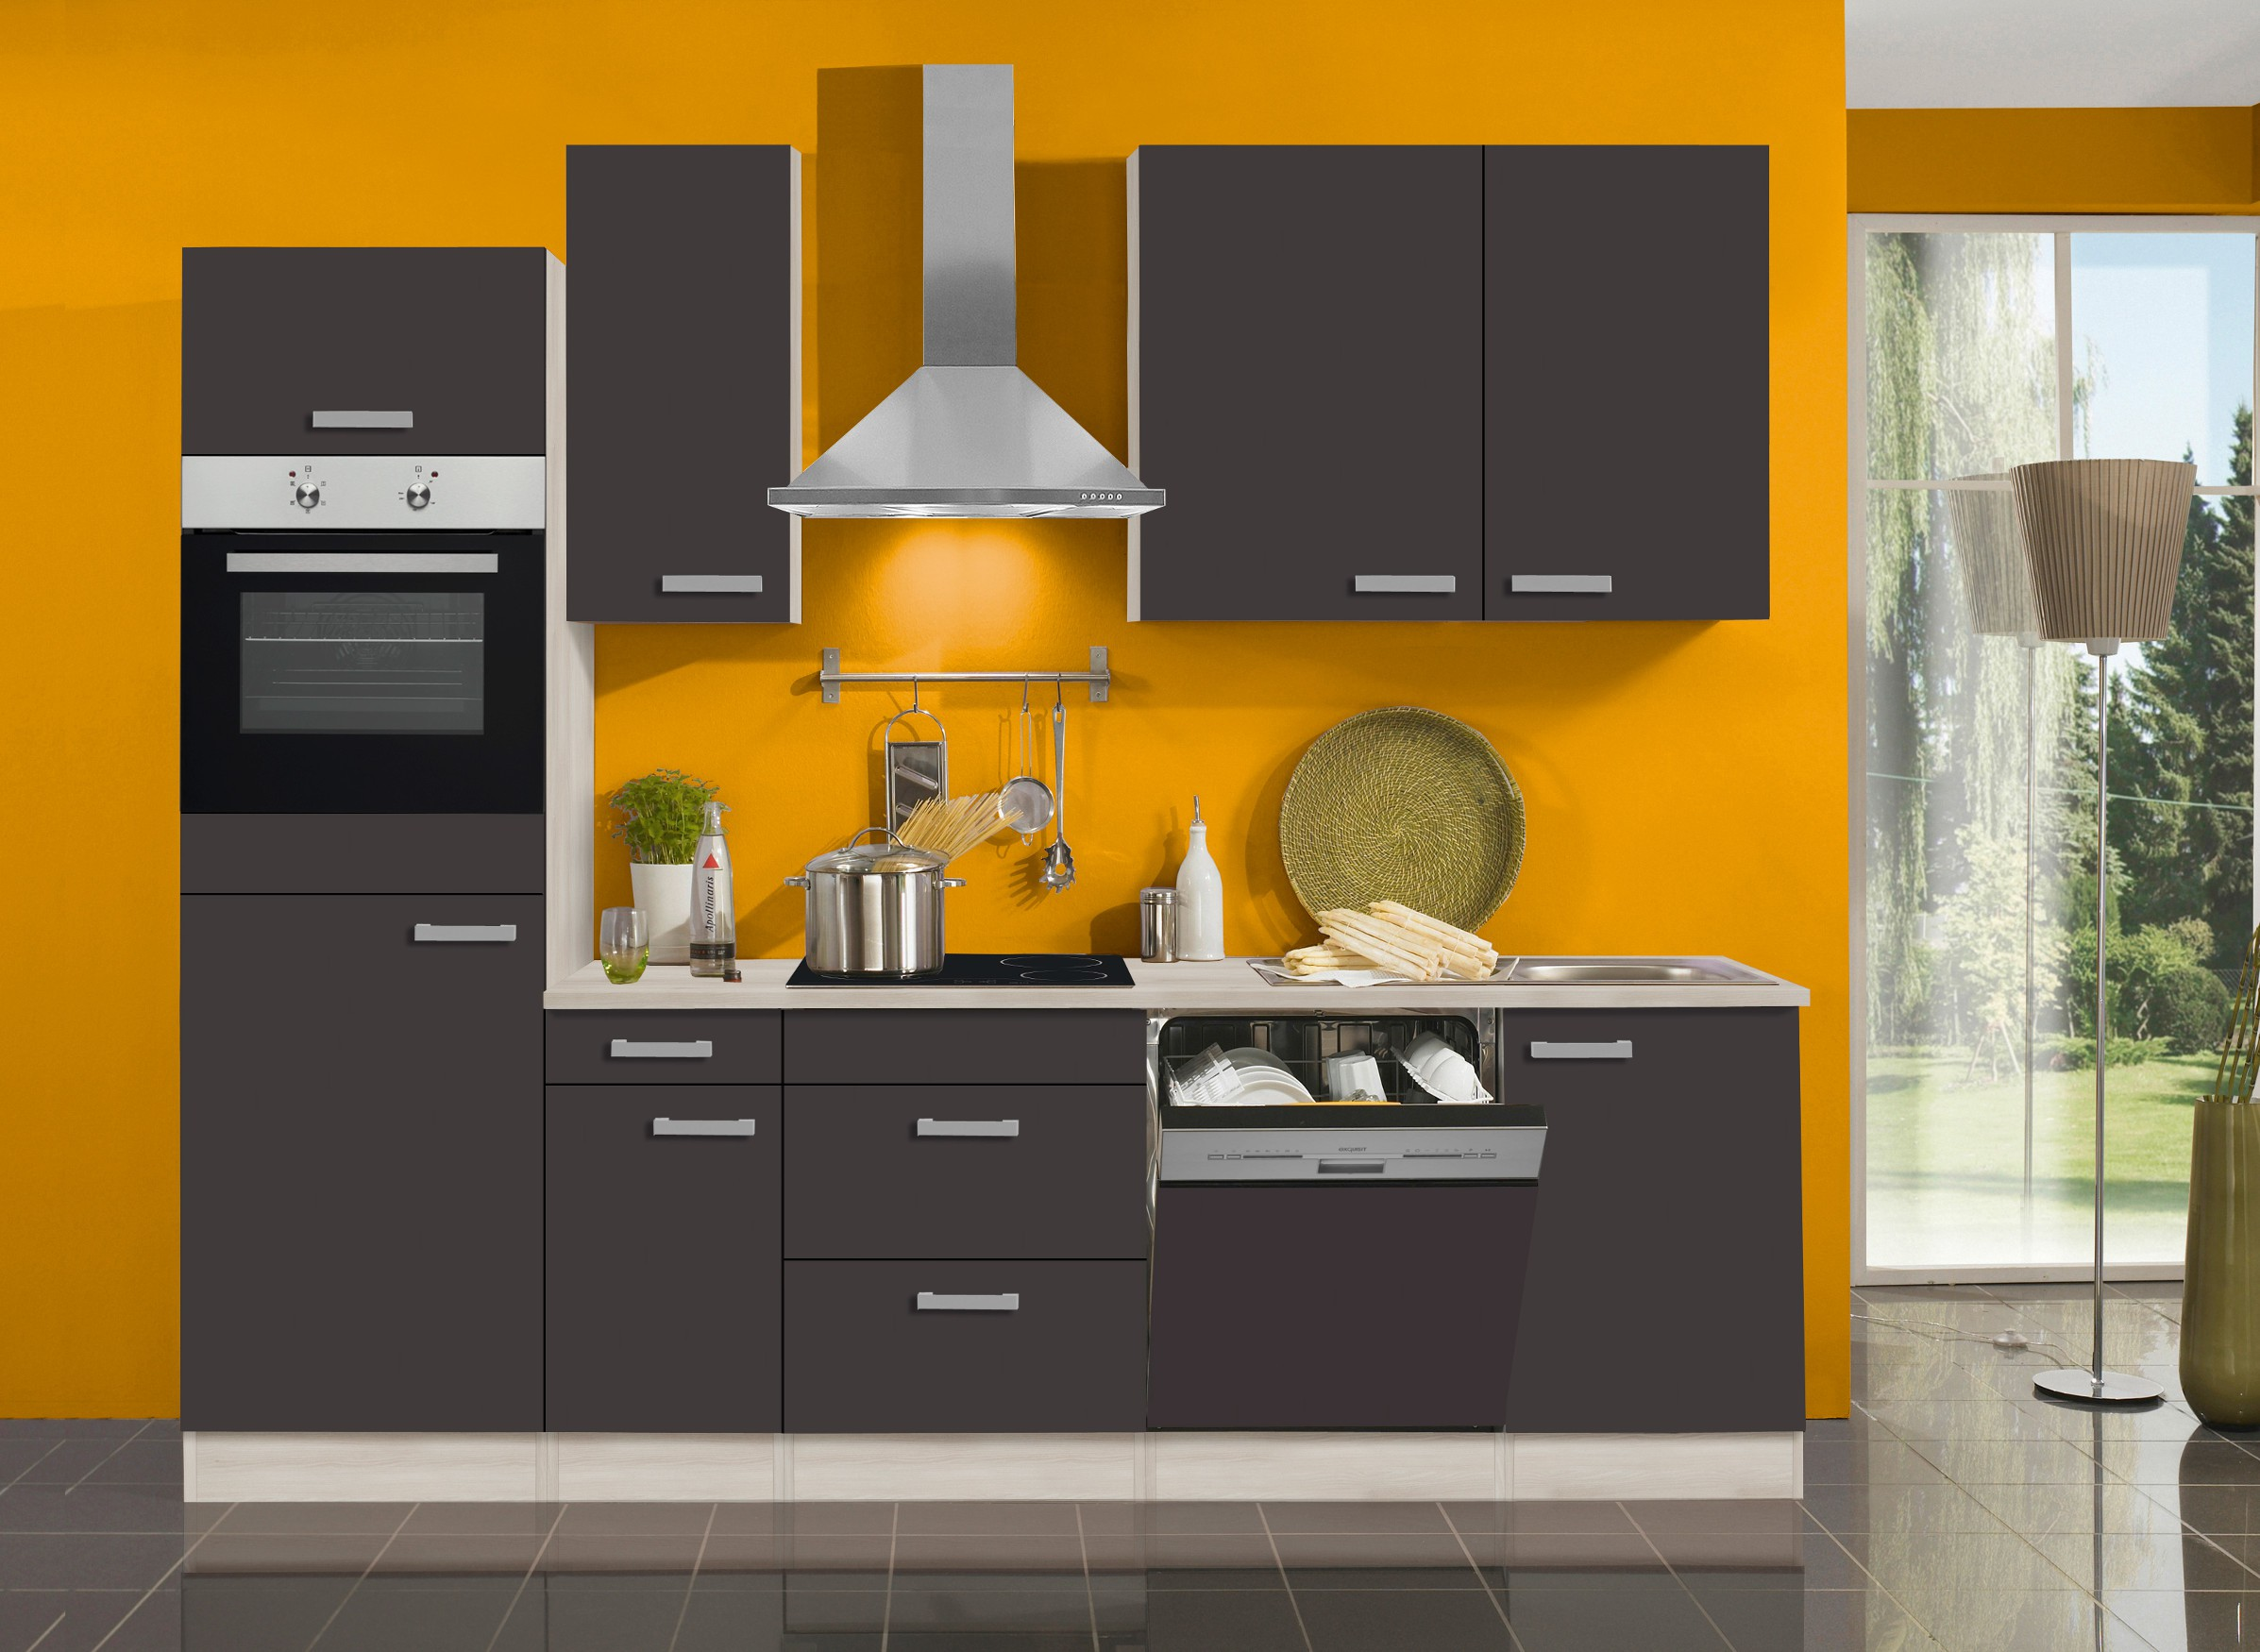 k chenzeile barcelona vario 8 1 k che mit e ger ten breite 270 cm grau k che k chenzeilen. Black Bedroom Furniture Sets. Home Design Ideas